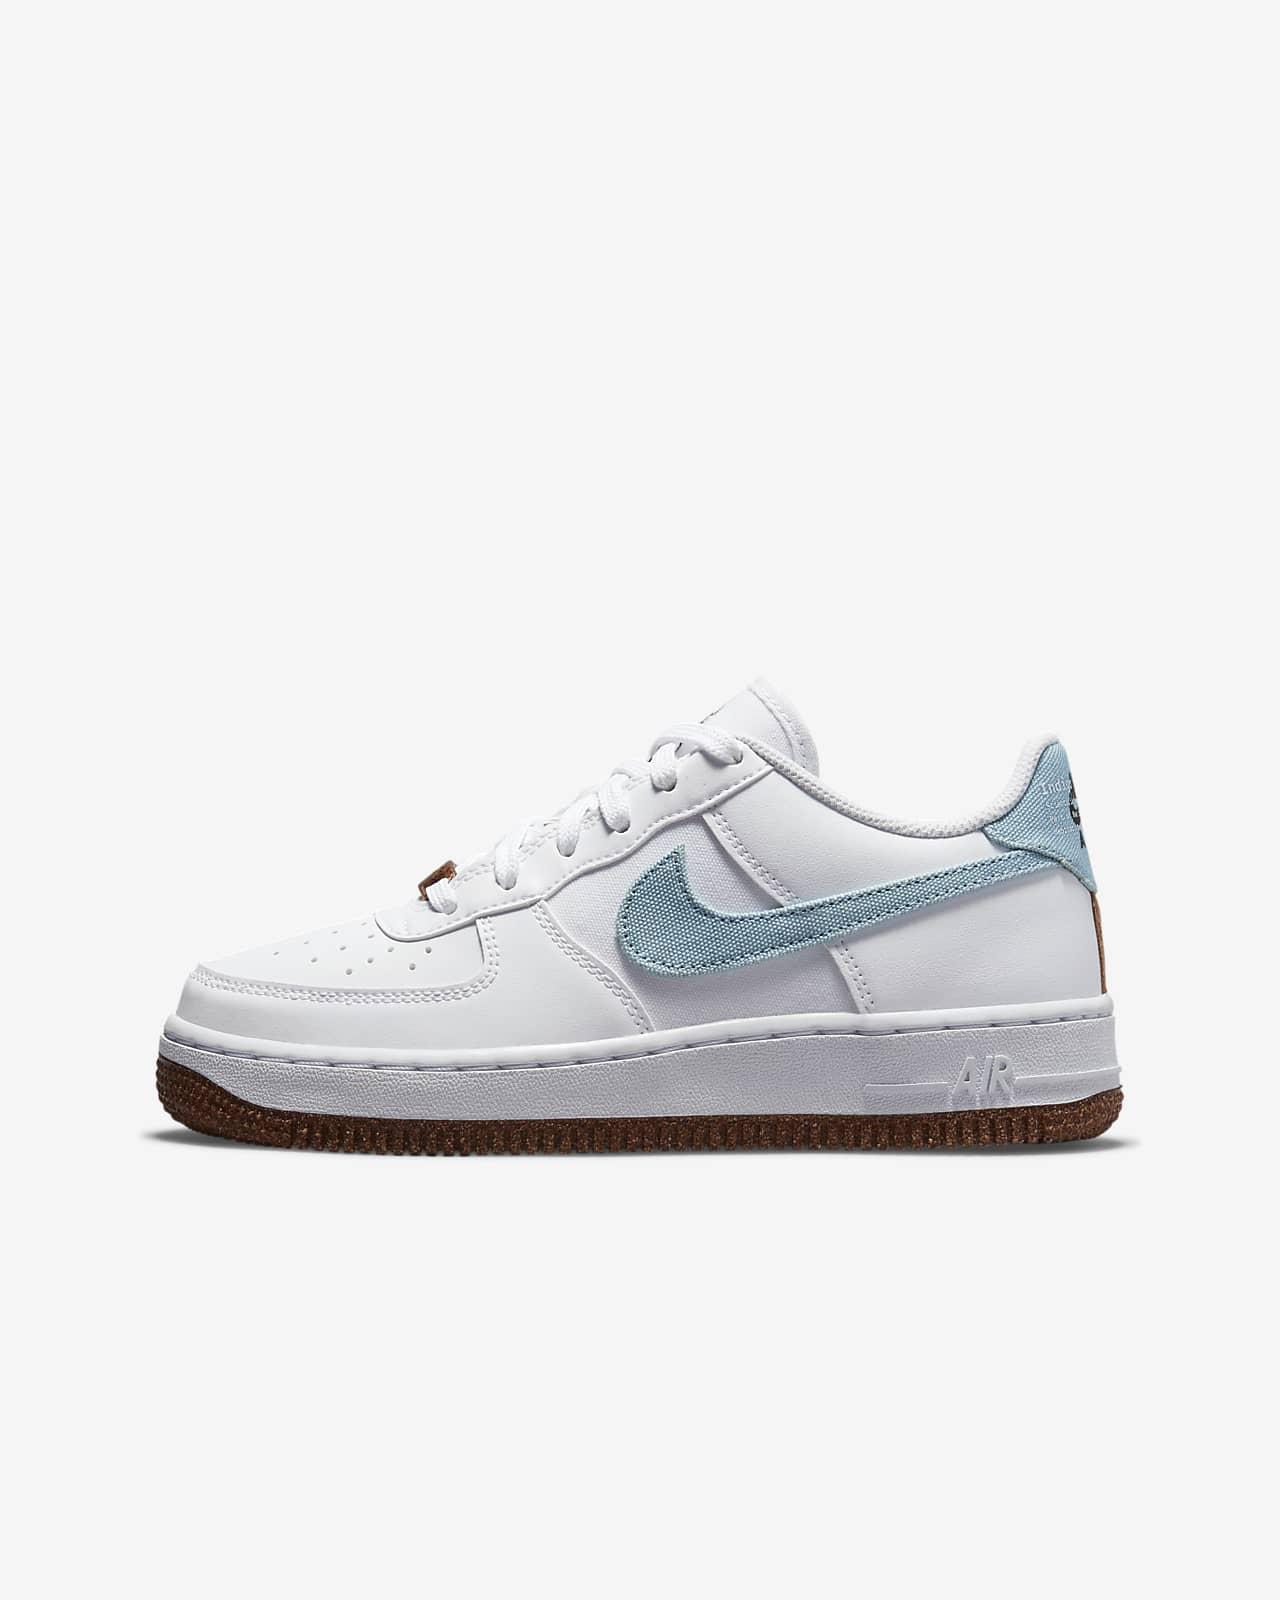 Nike Air Force 1 LV8 (GS) 大童运动童鞋